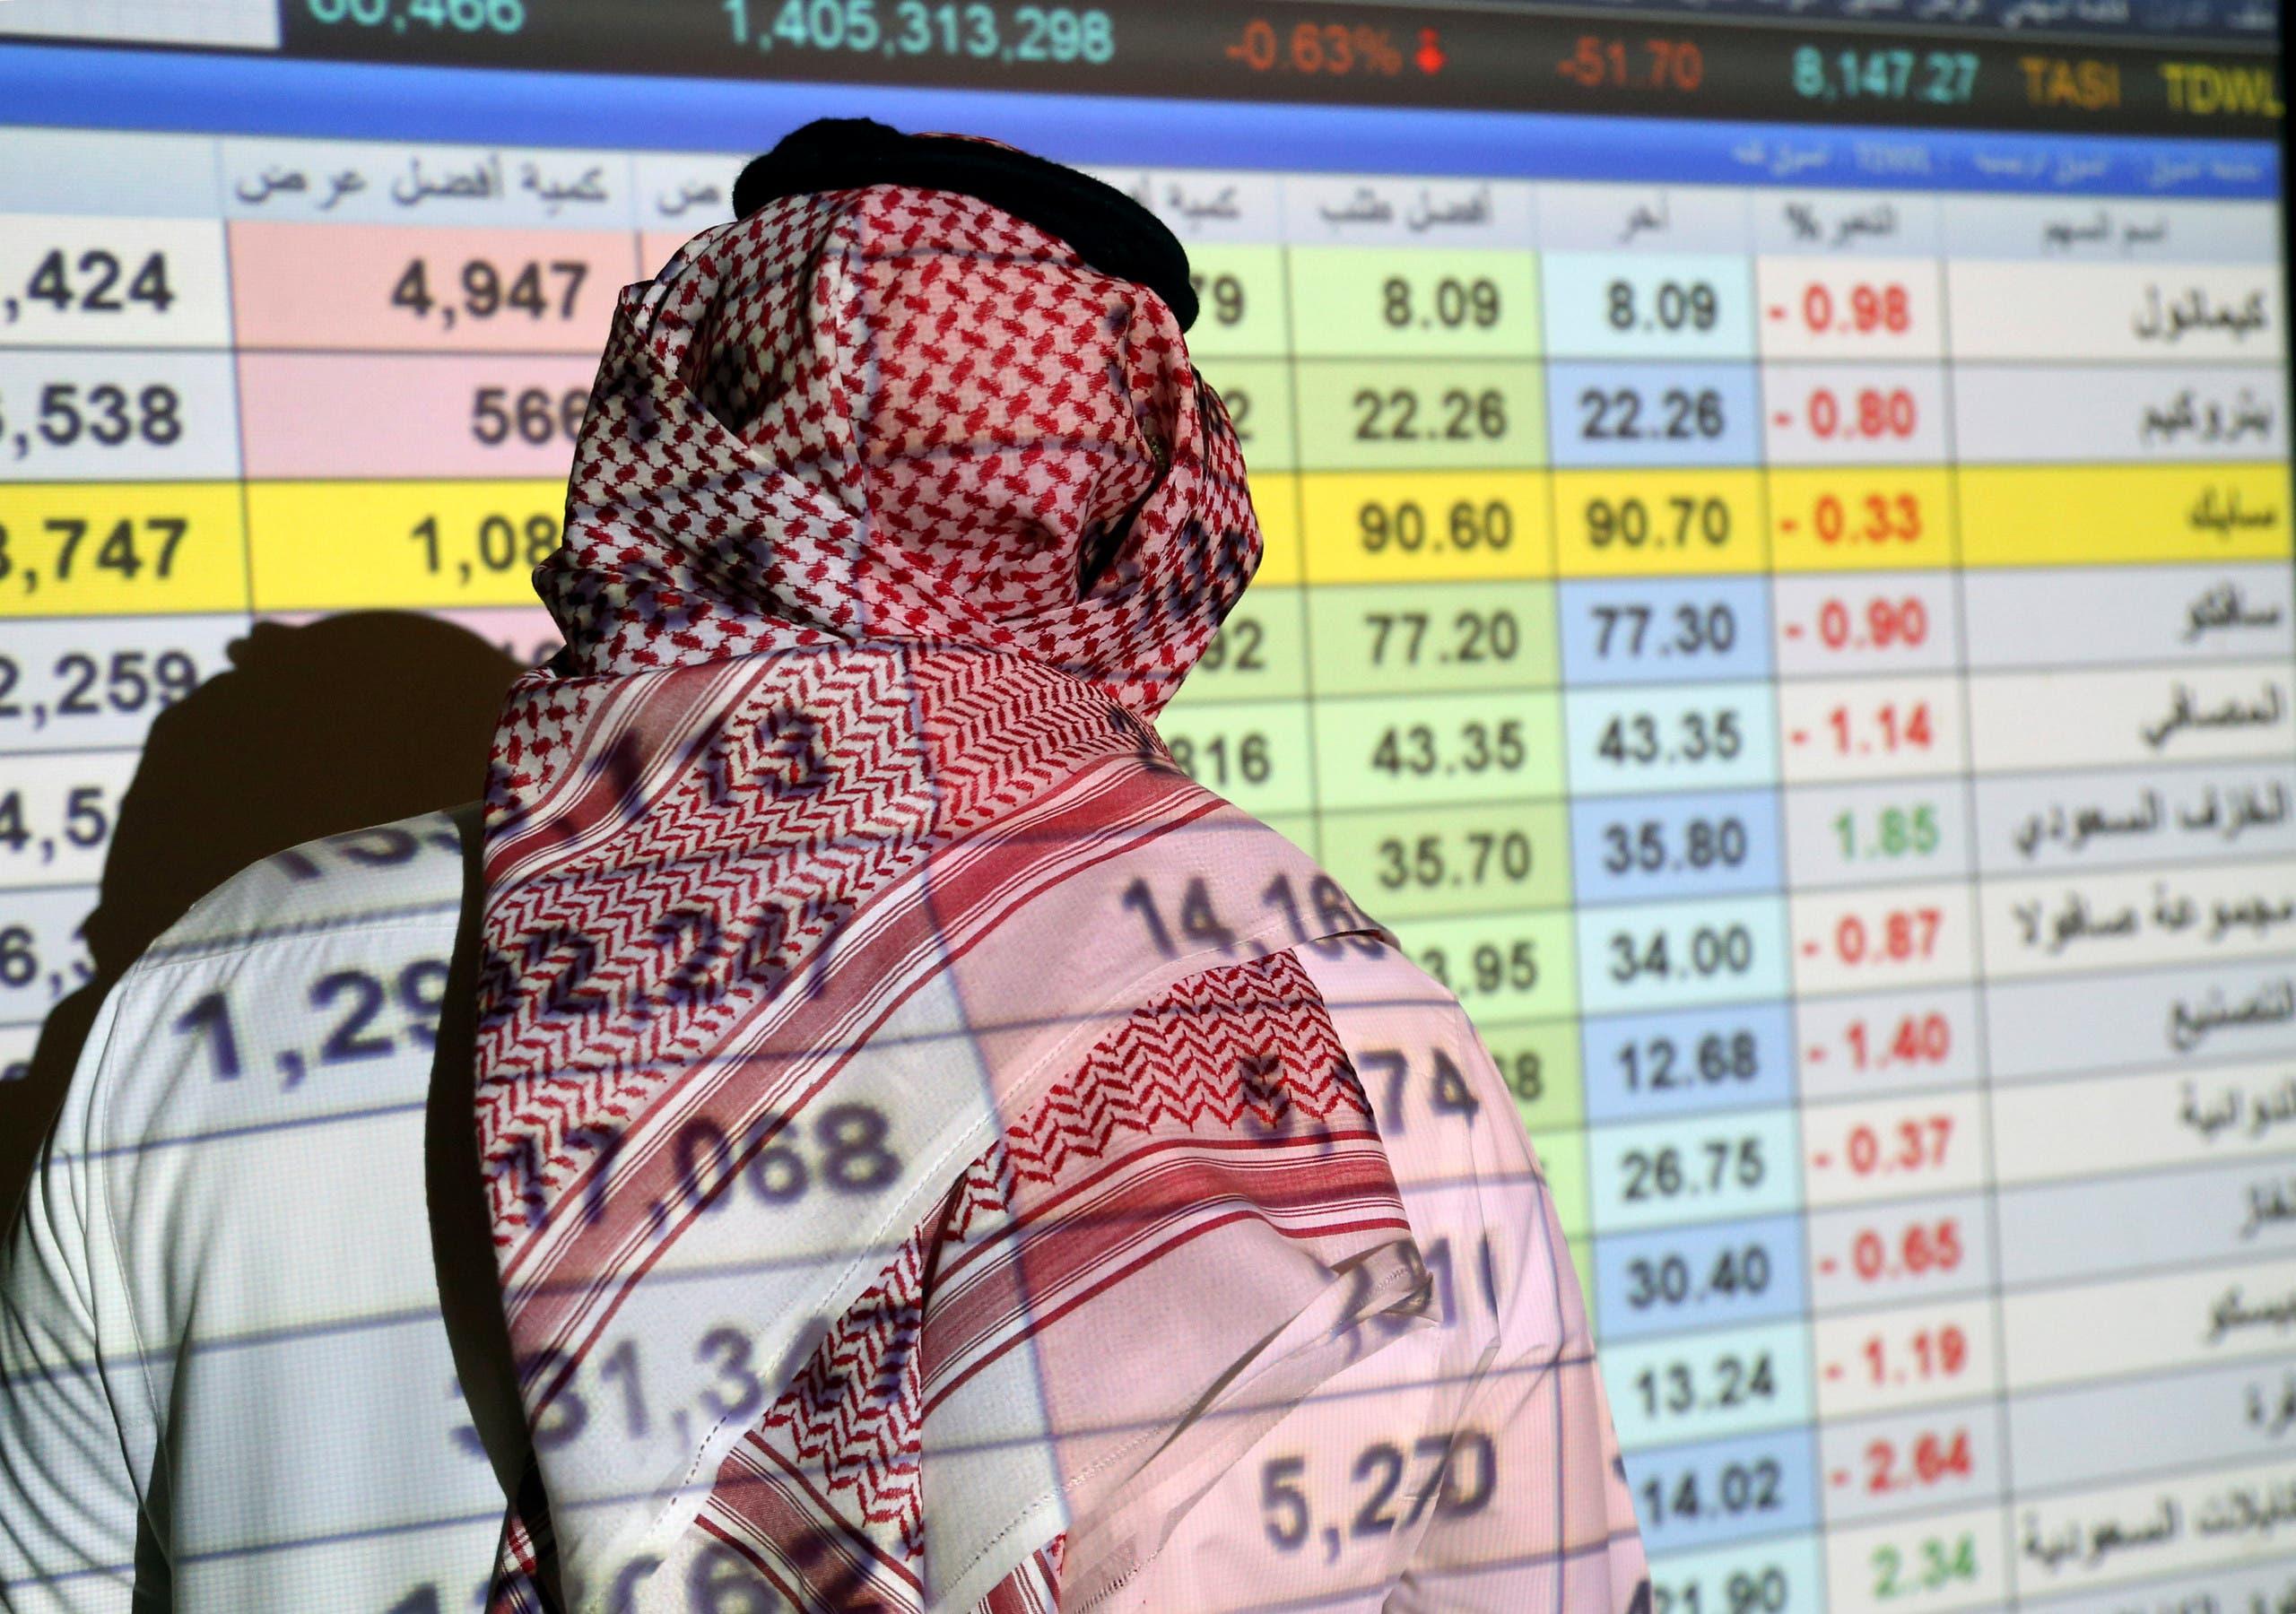 A Saudi trader monitors stocks at the Saudi stock market in Riyadh, Saudi Arabia, January 8, 2020. (Reuters)